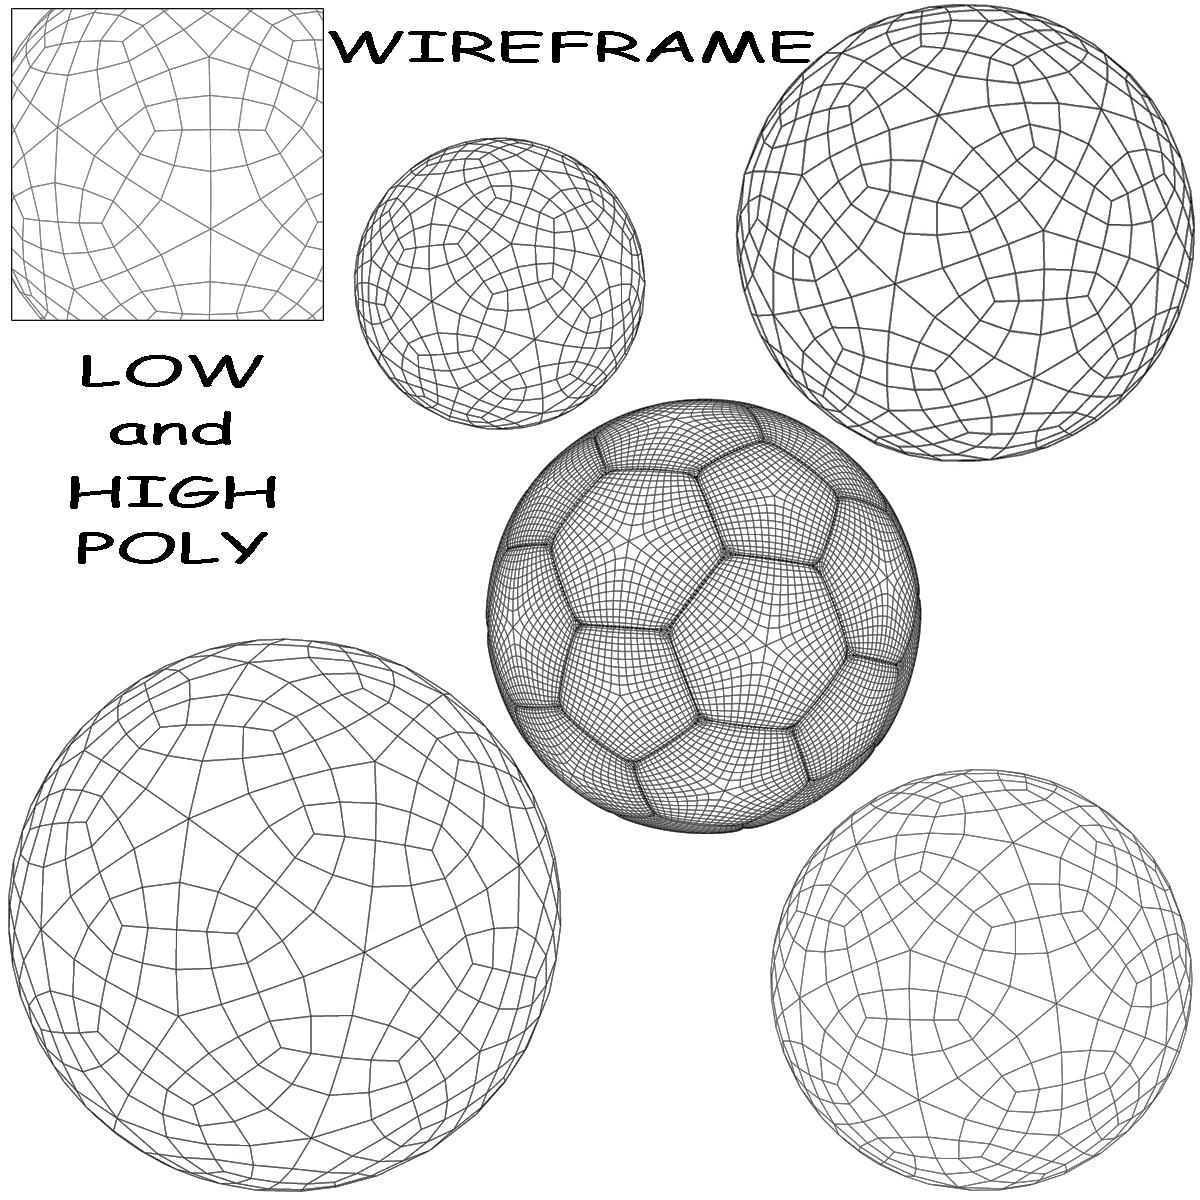 soccerball цагаан 3d загвар 3ds max fbx c4d ma mb obj 205181